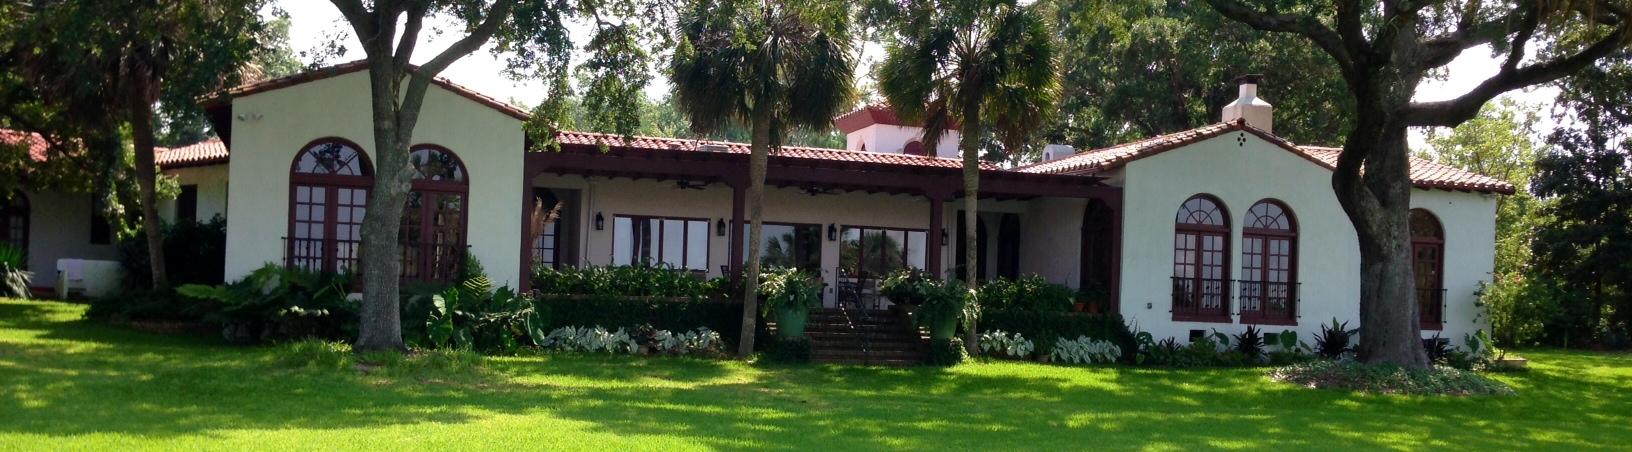 Designated Mississippi Landmark